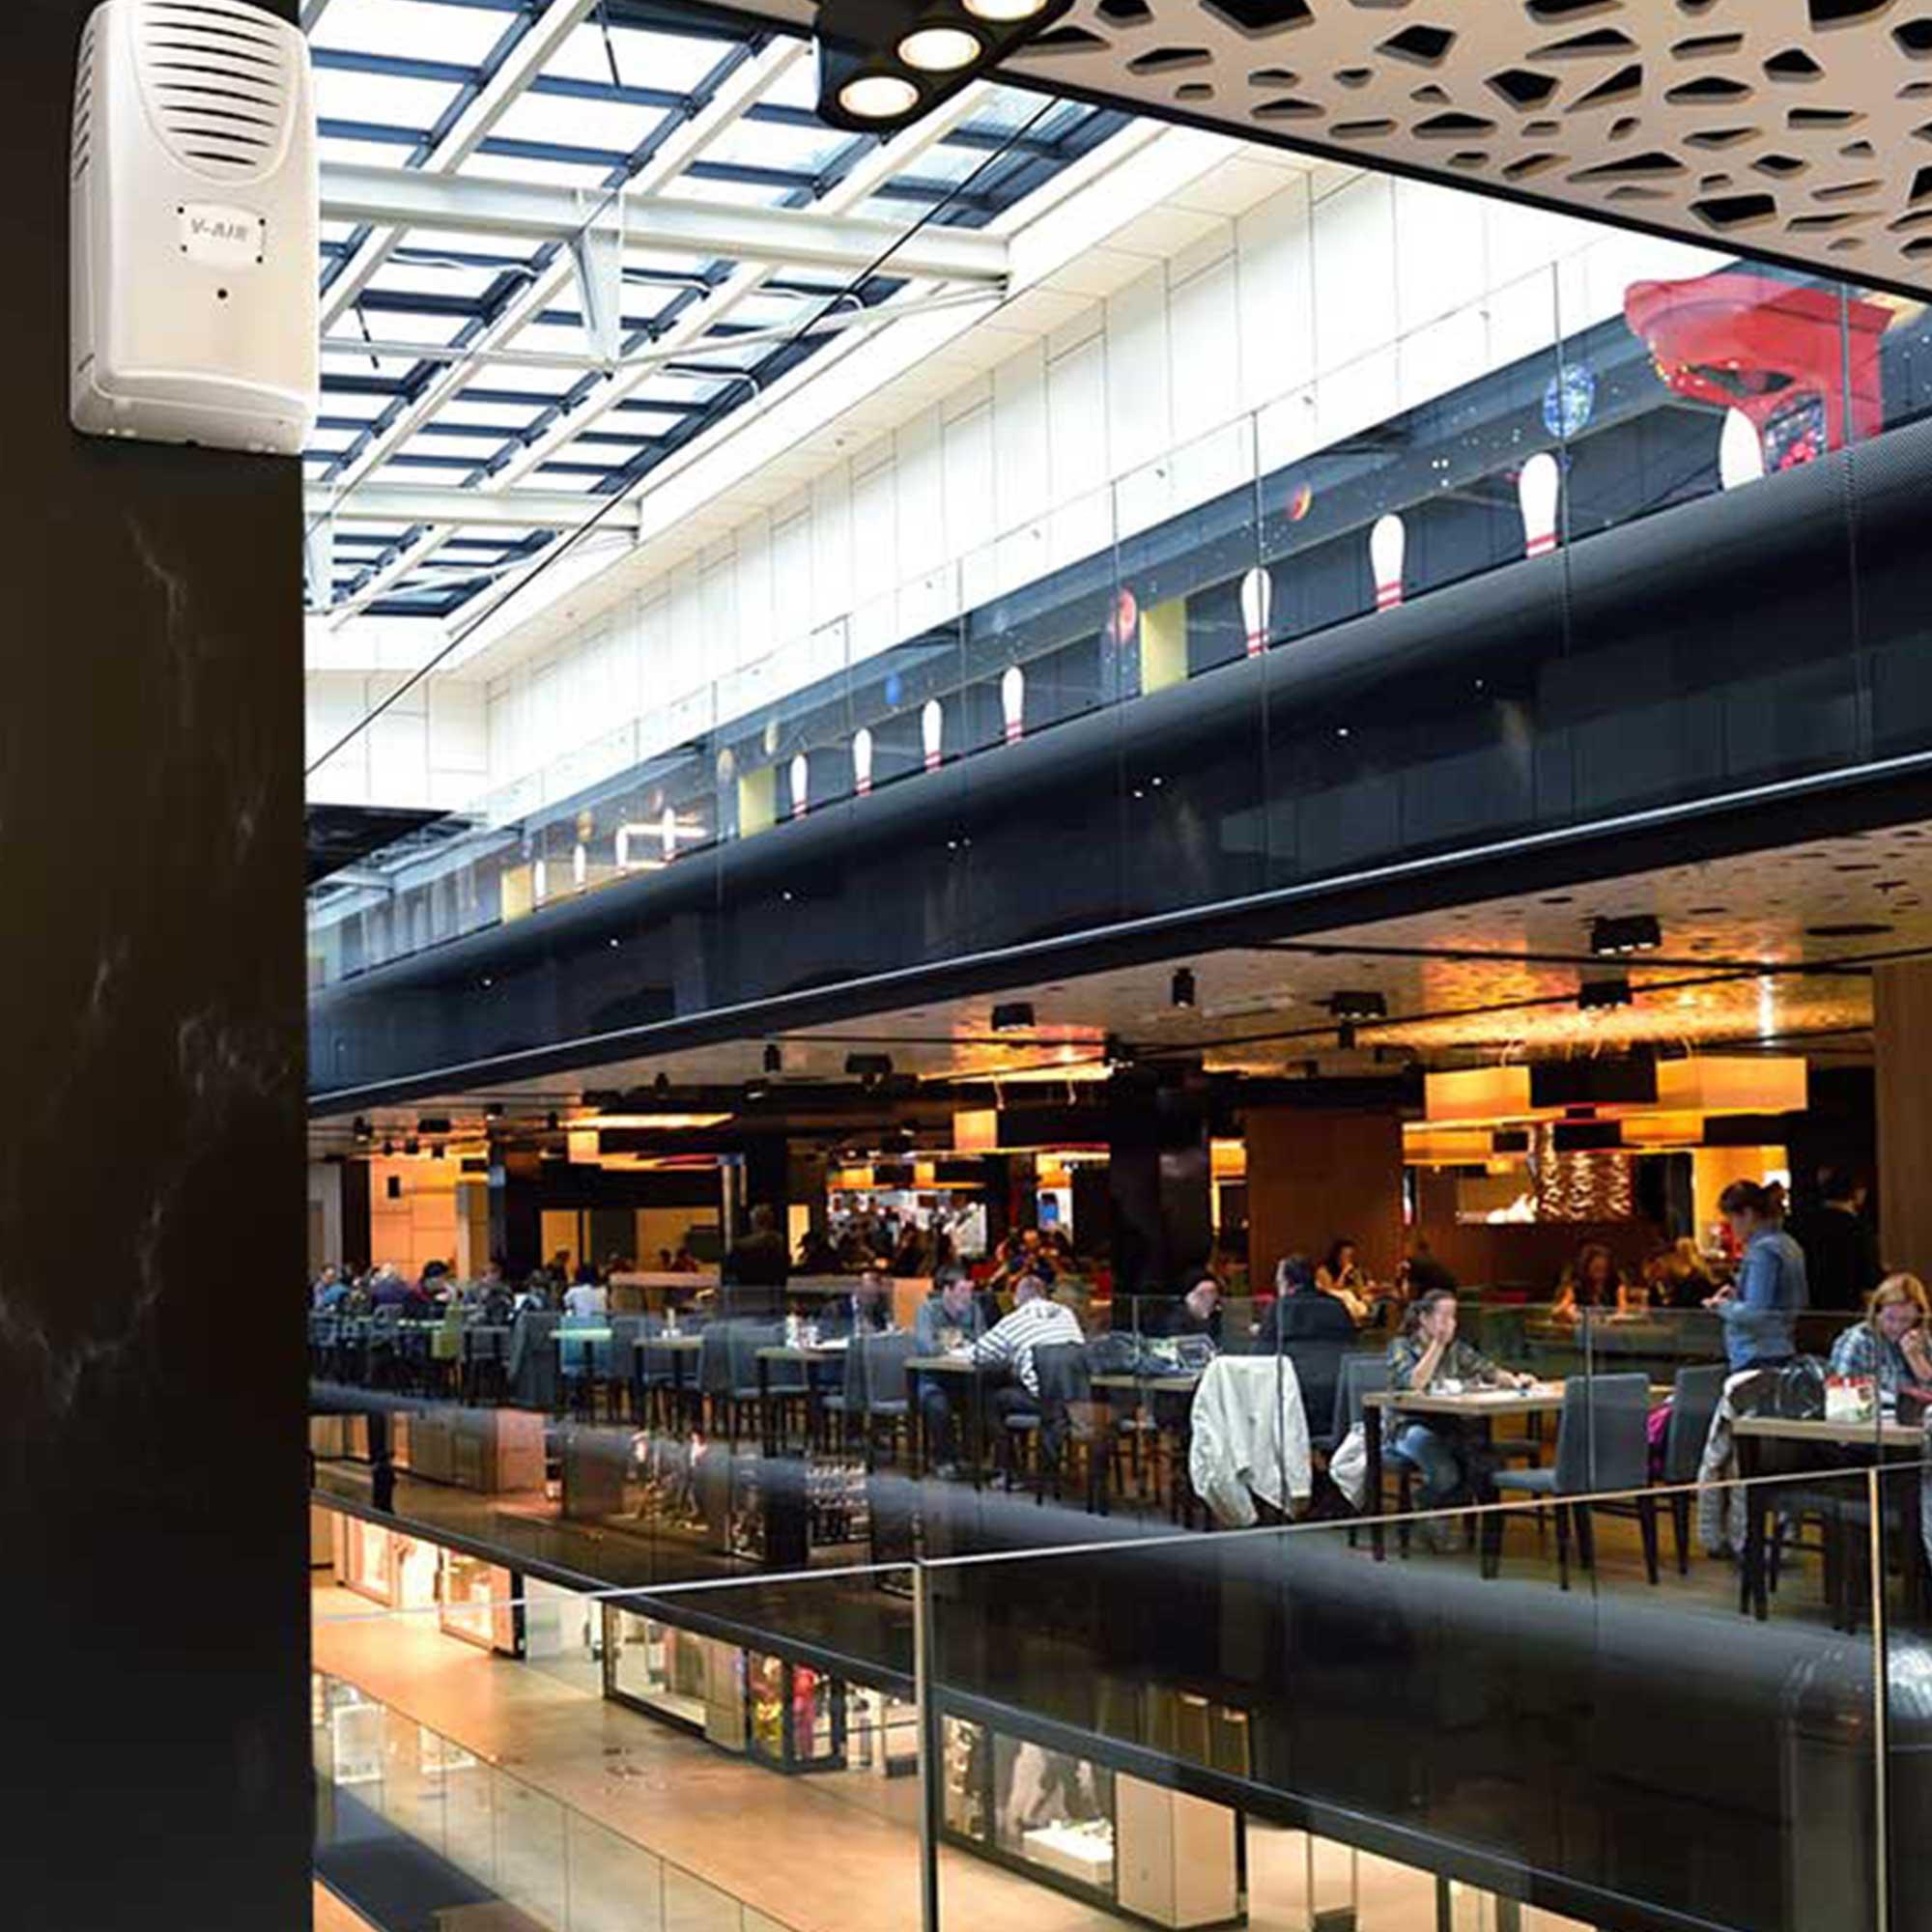 Shopping Malls - V-Air SOLID Plus - Restaurants